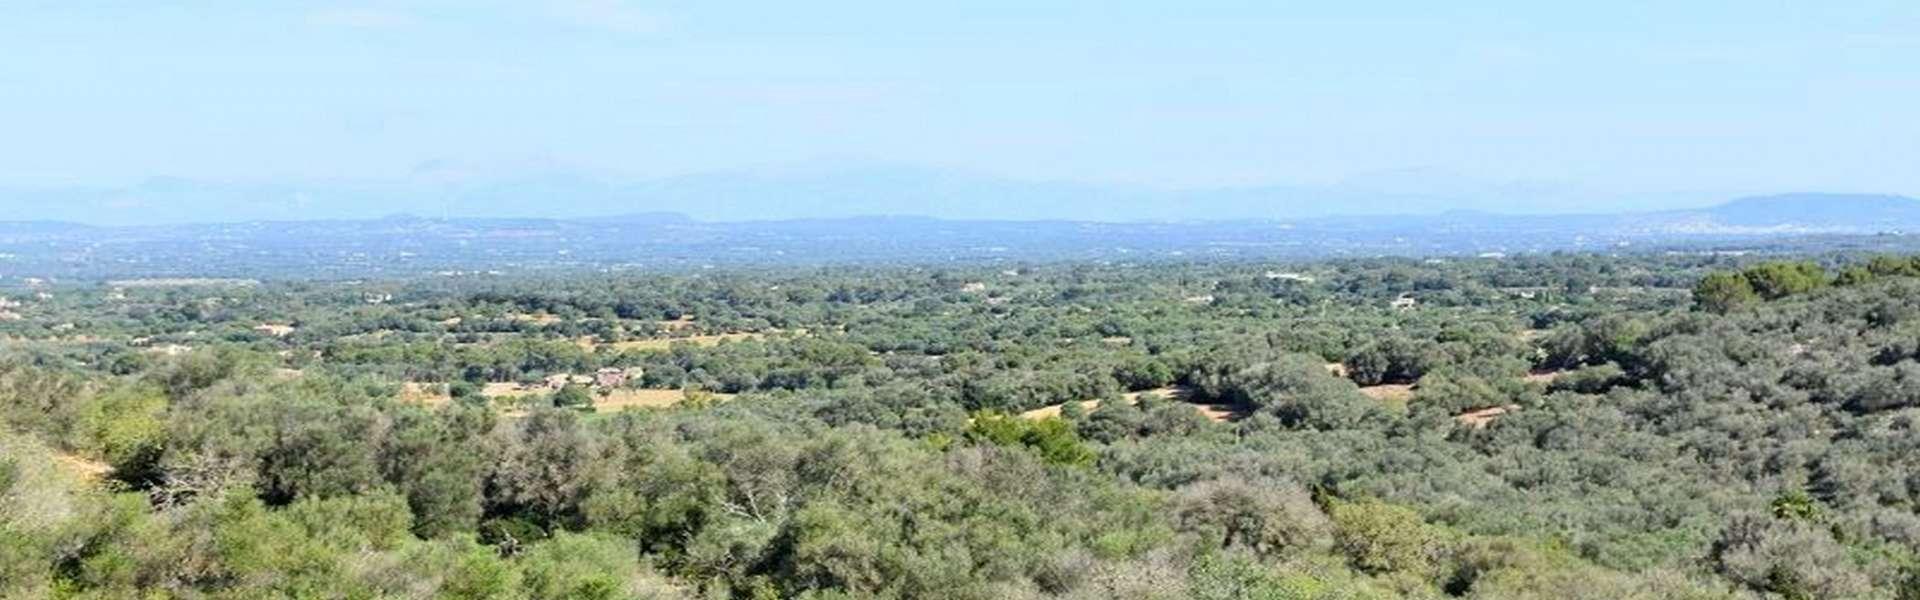 Cas Concos - Typisch mallorquinische Finca mit traumhaftem Panoramablick